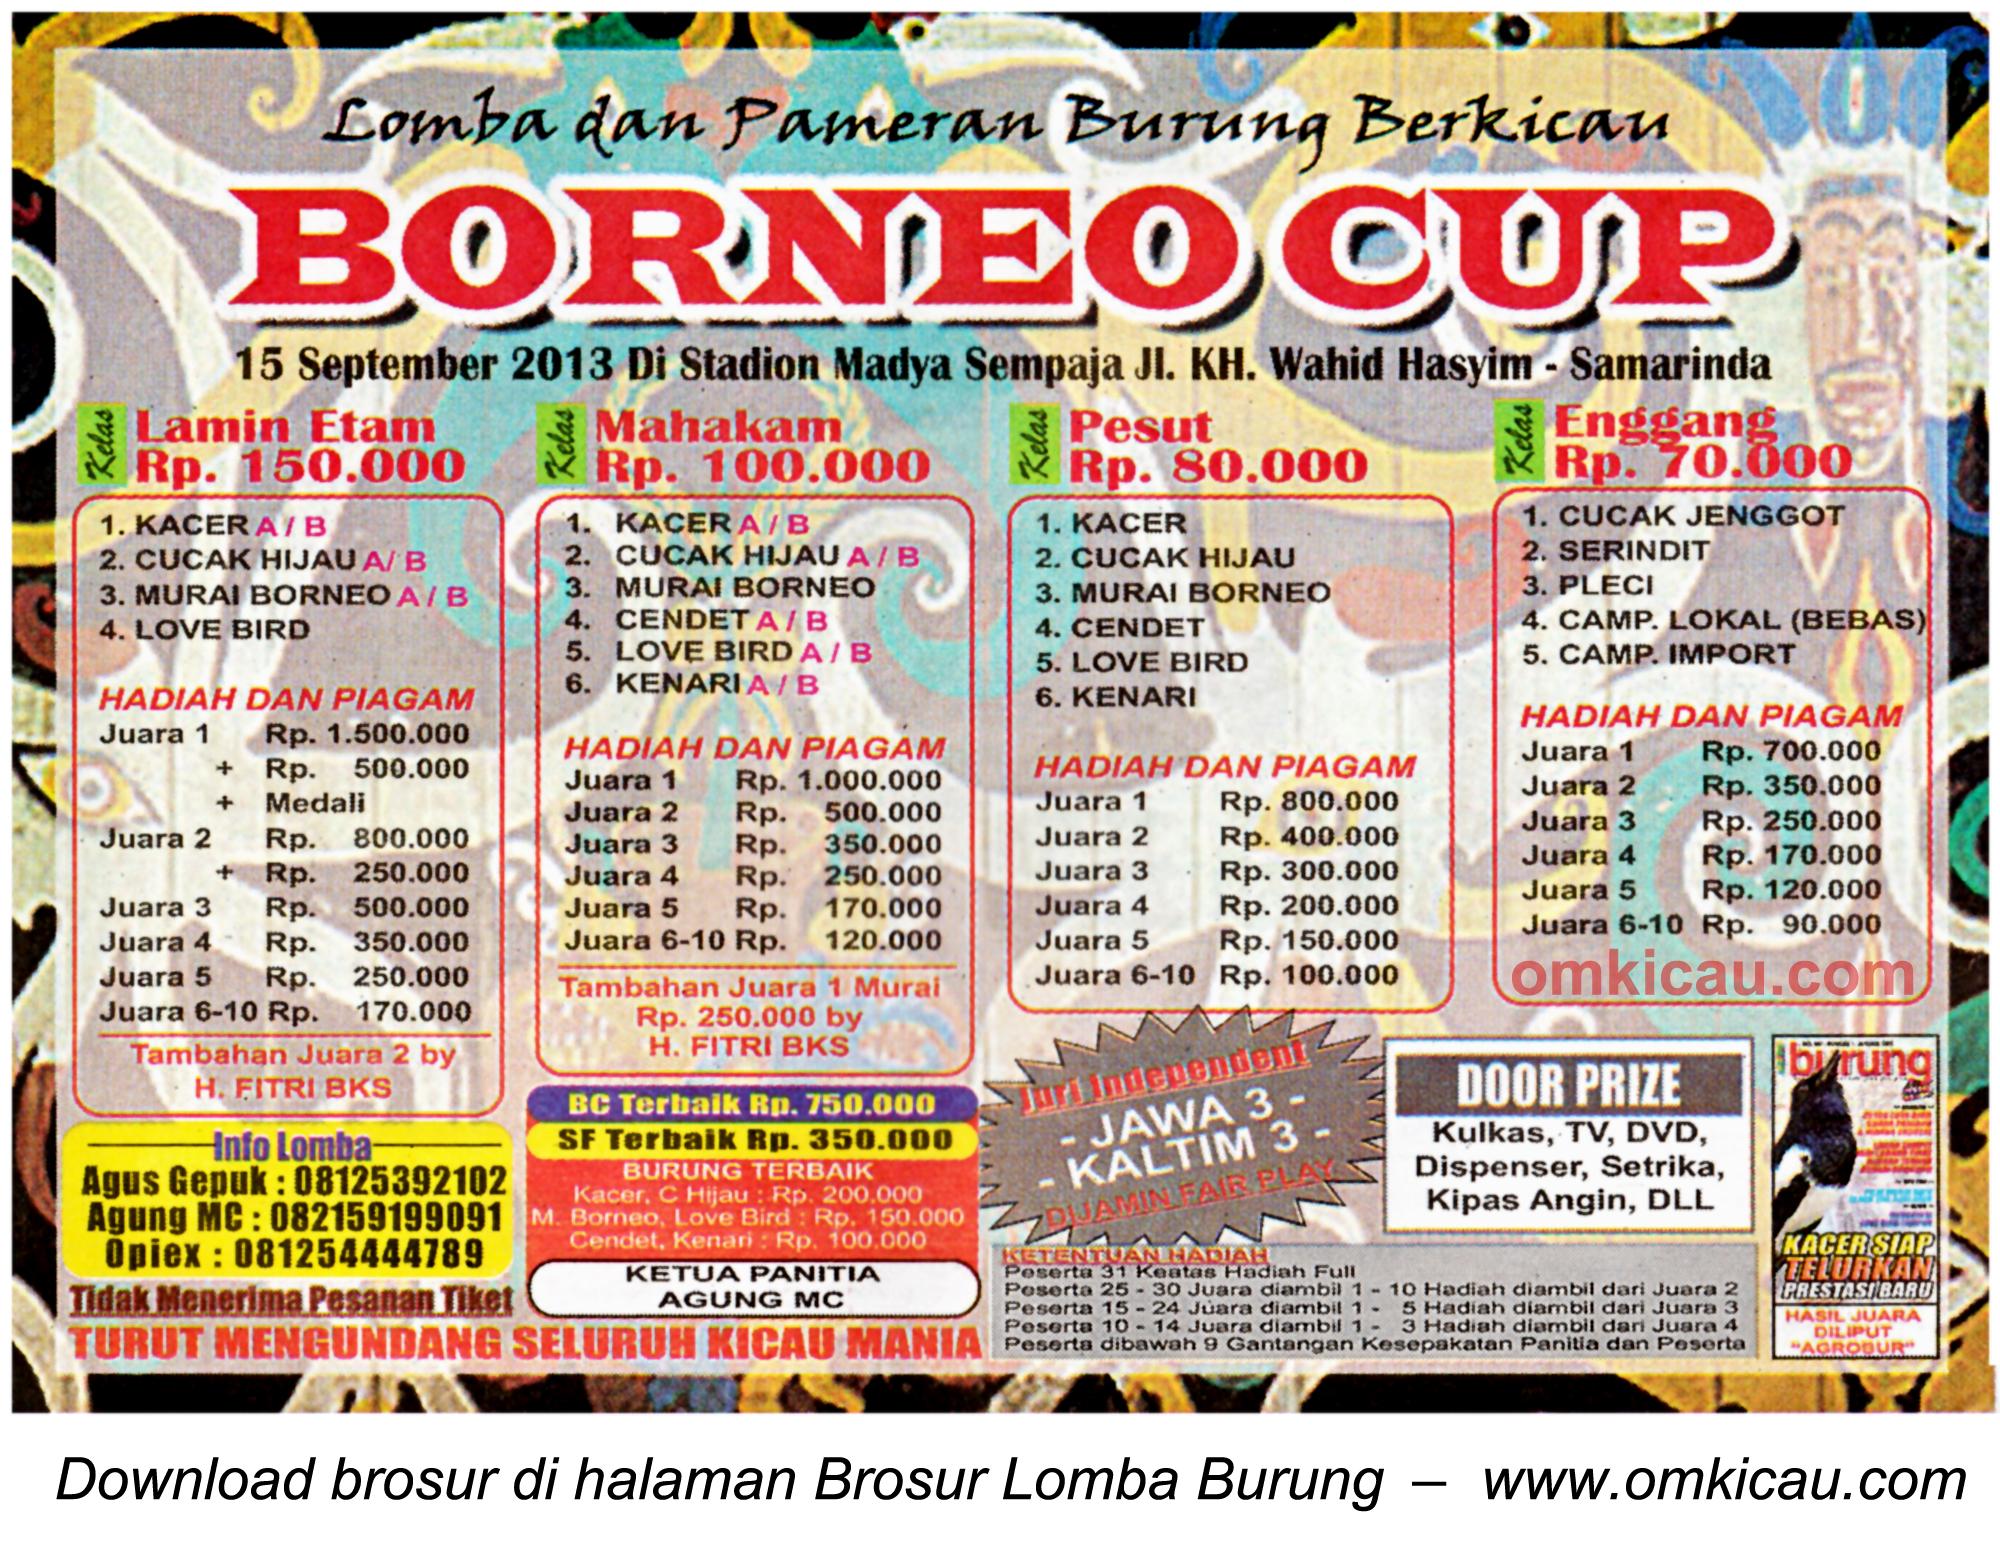 Brosur Lomba Burung Borneo Cup Samarinda 15 Sept 2013